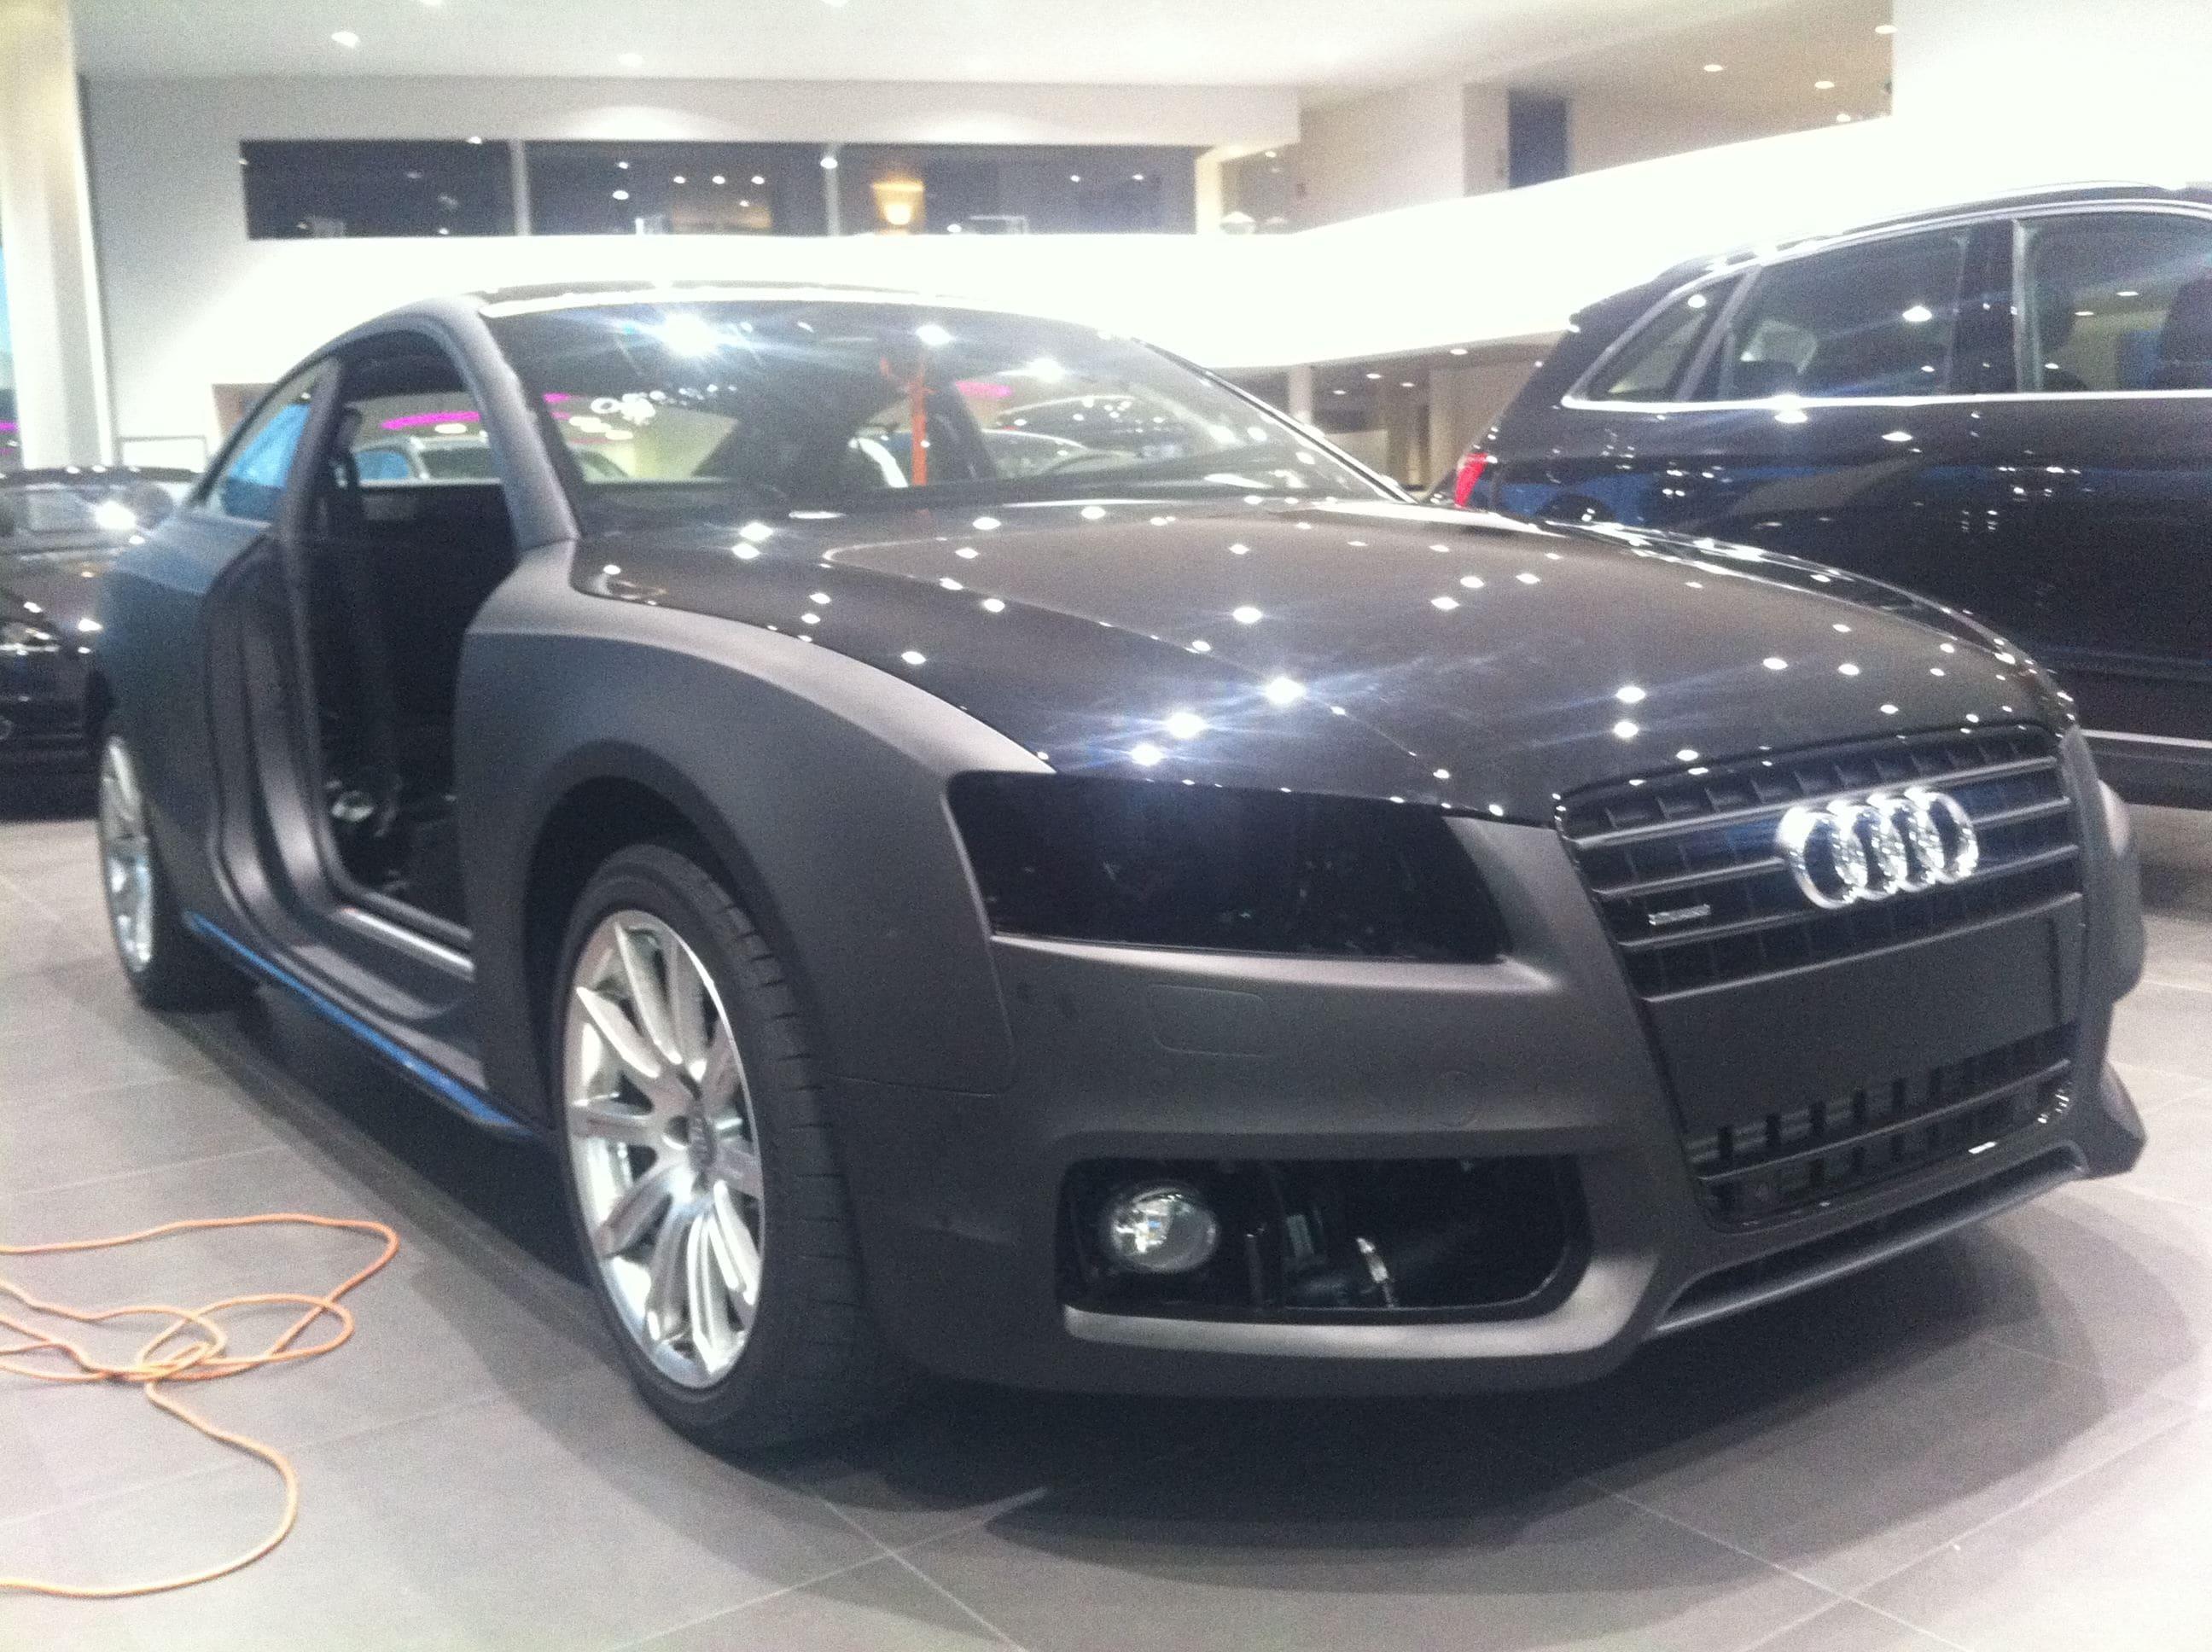 Audi A5 Coupe met Mat Zwarte Wrap, Carwrapping door Wrapmyride.nu Foto-nr:4572, ©2021